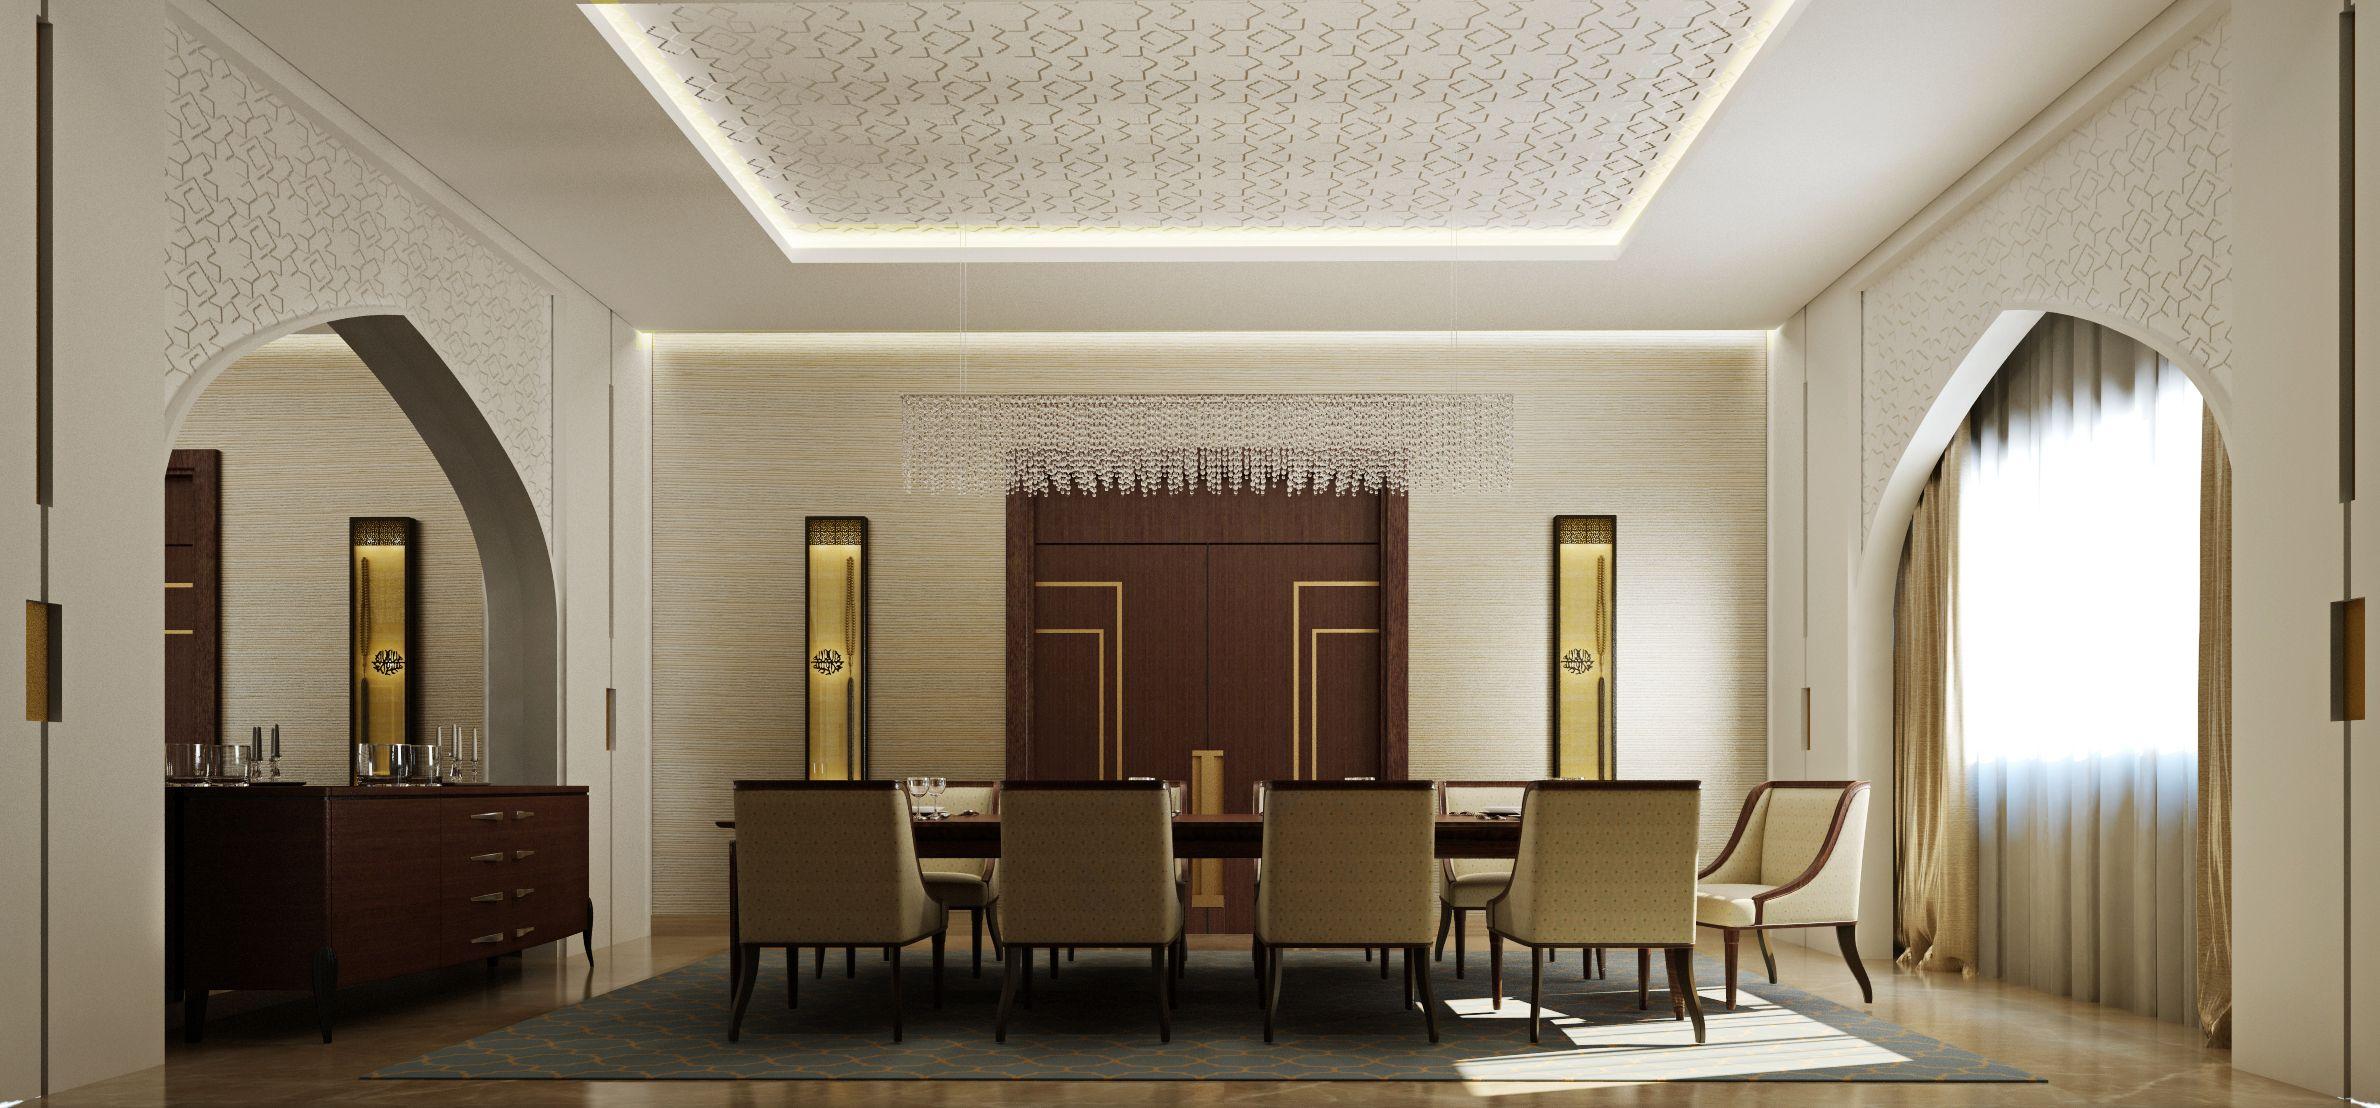 Mimar Interiors Mimar Interiors Interior Design